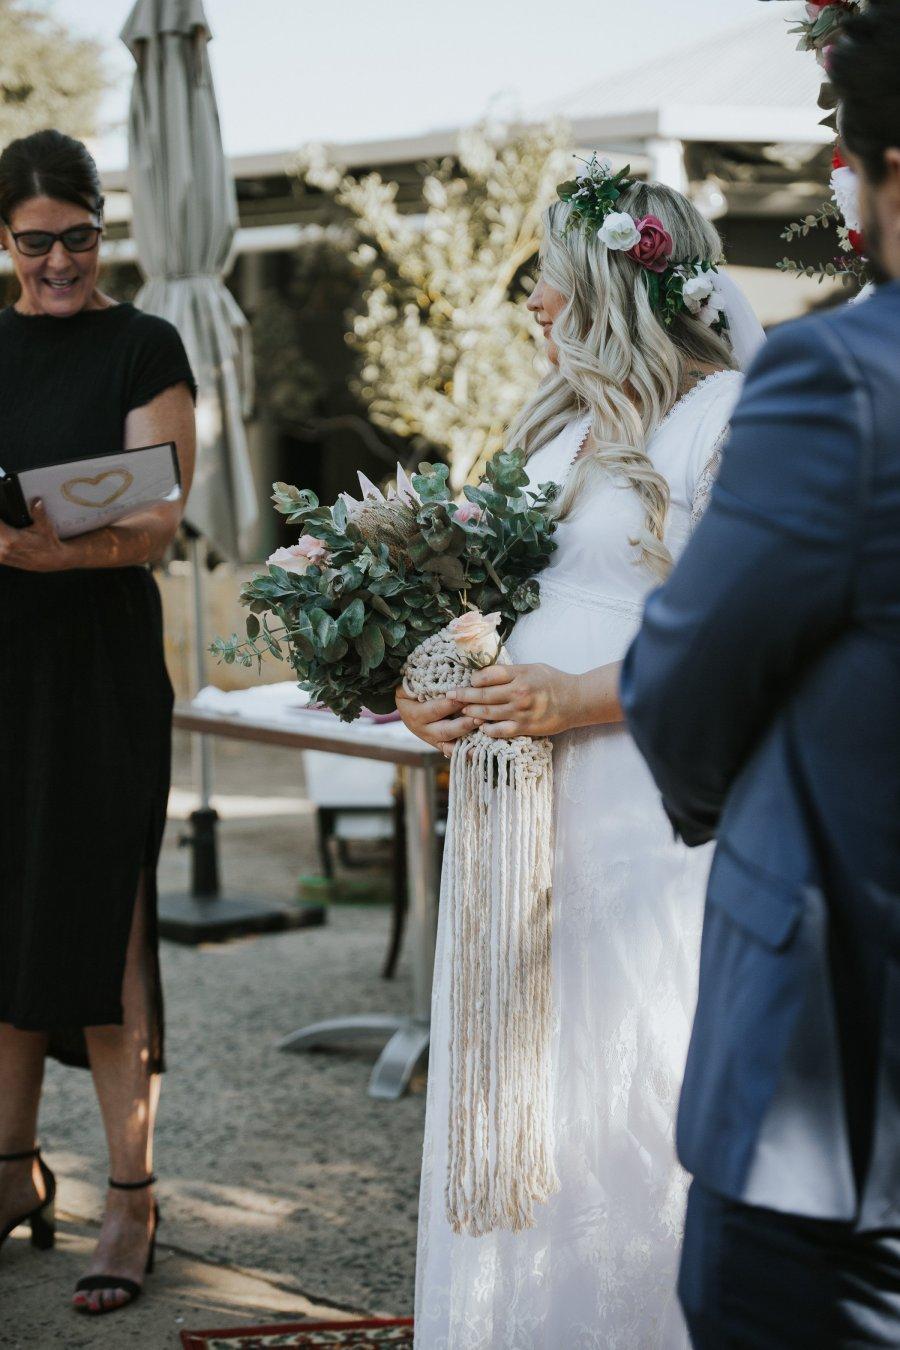 Ebony Blush Photography   Perth wedding Photographer   Perth City Farm Wedding   Imogen + Tristian63